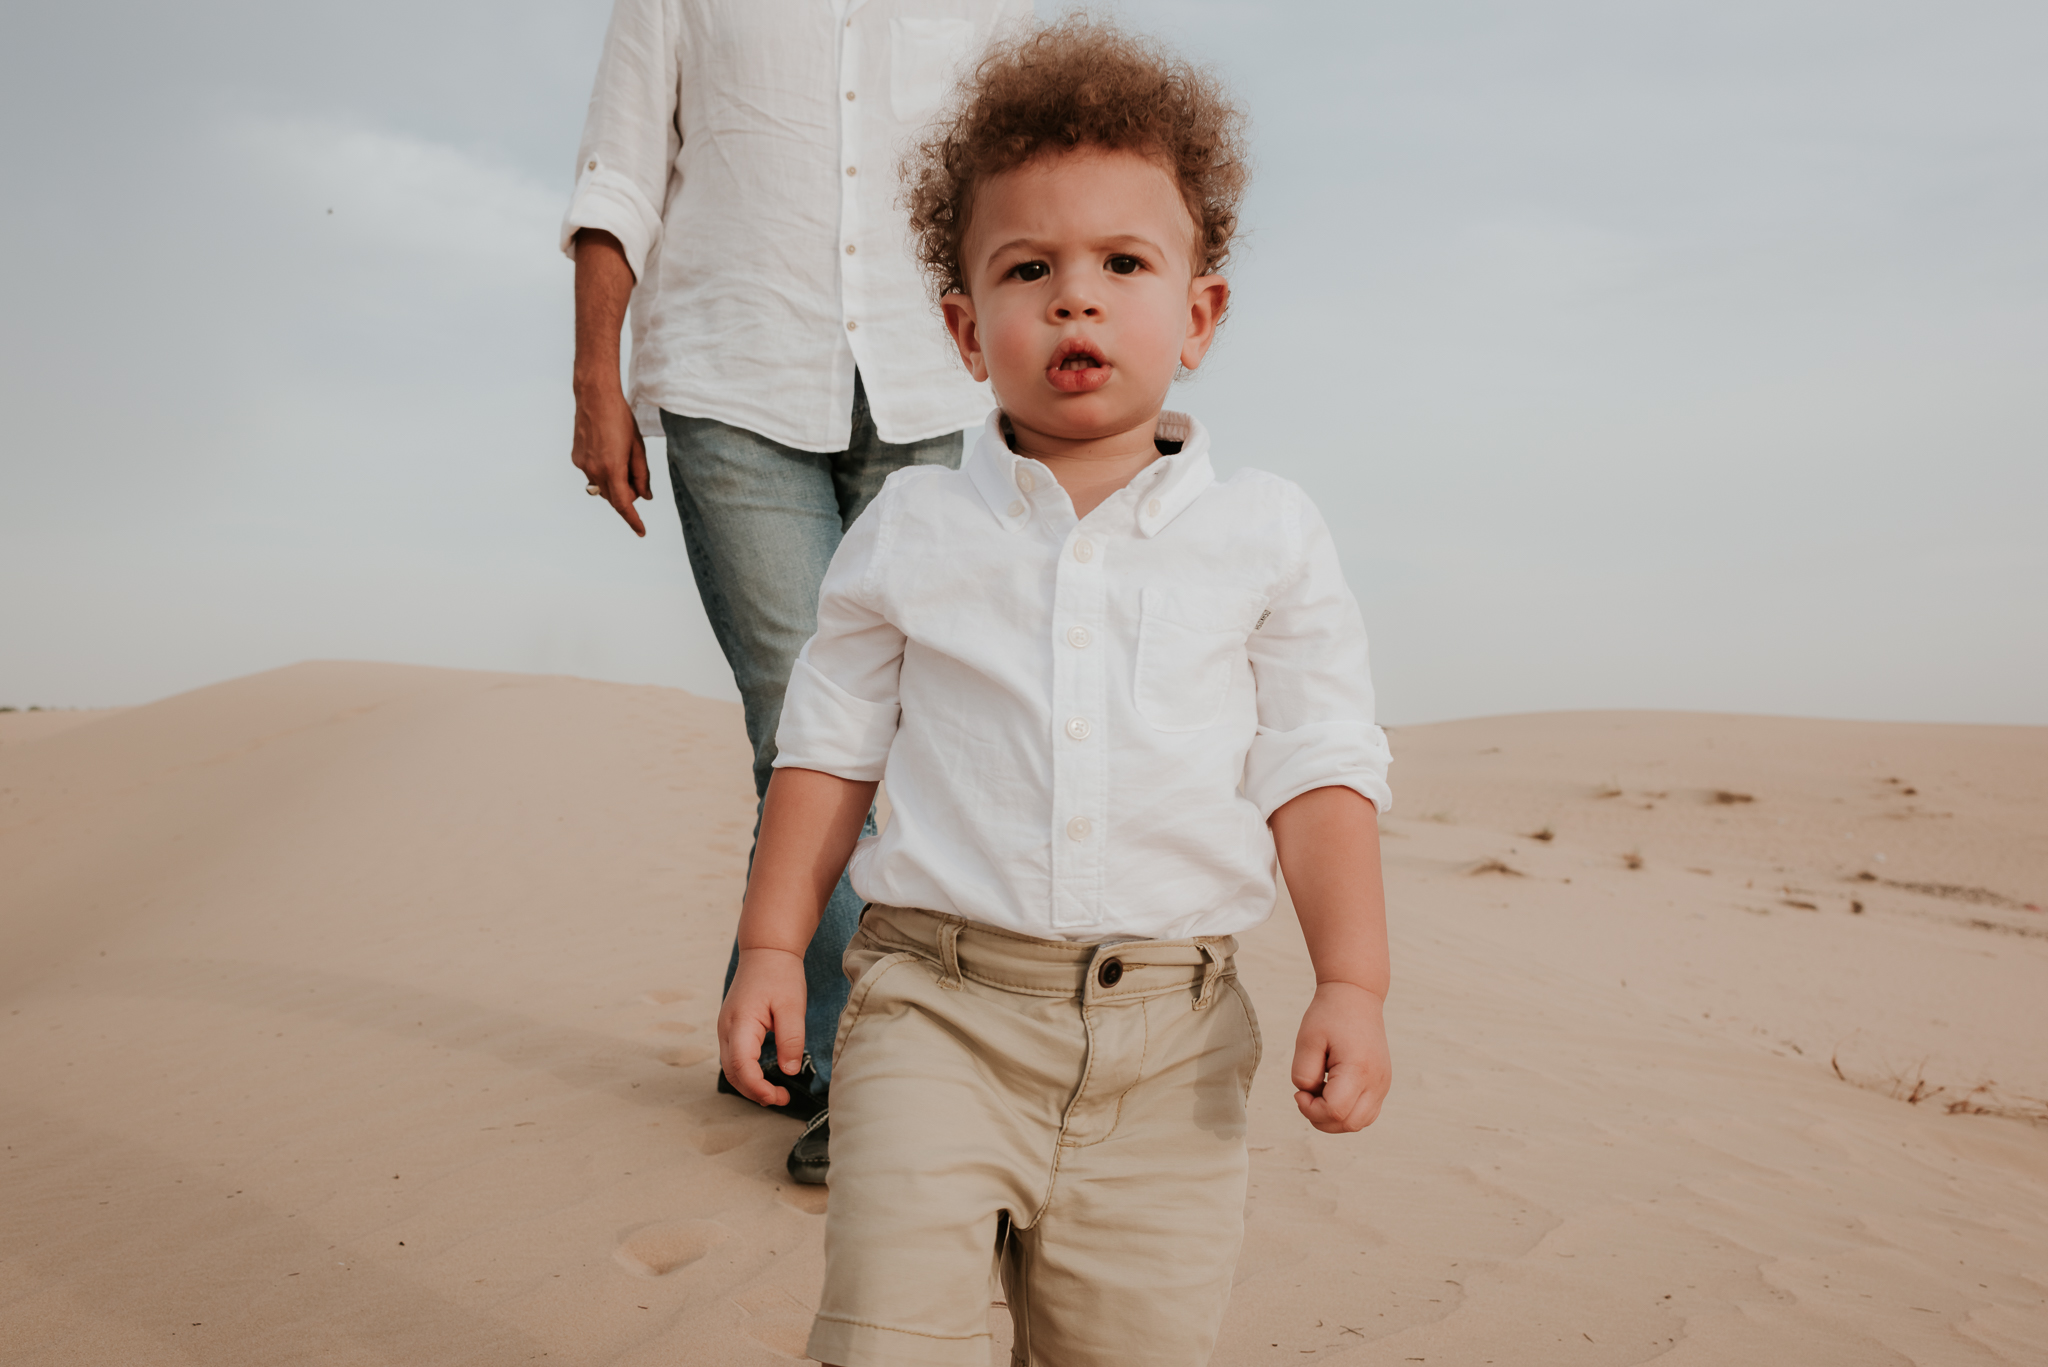 Lana-Photographs-Dubai-Maternity-Photographer-FatimaE-PSLR-26.jpg